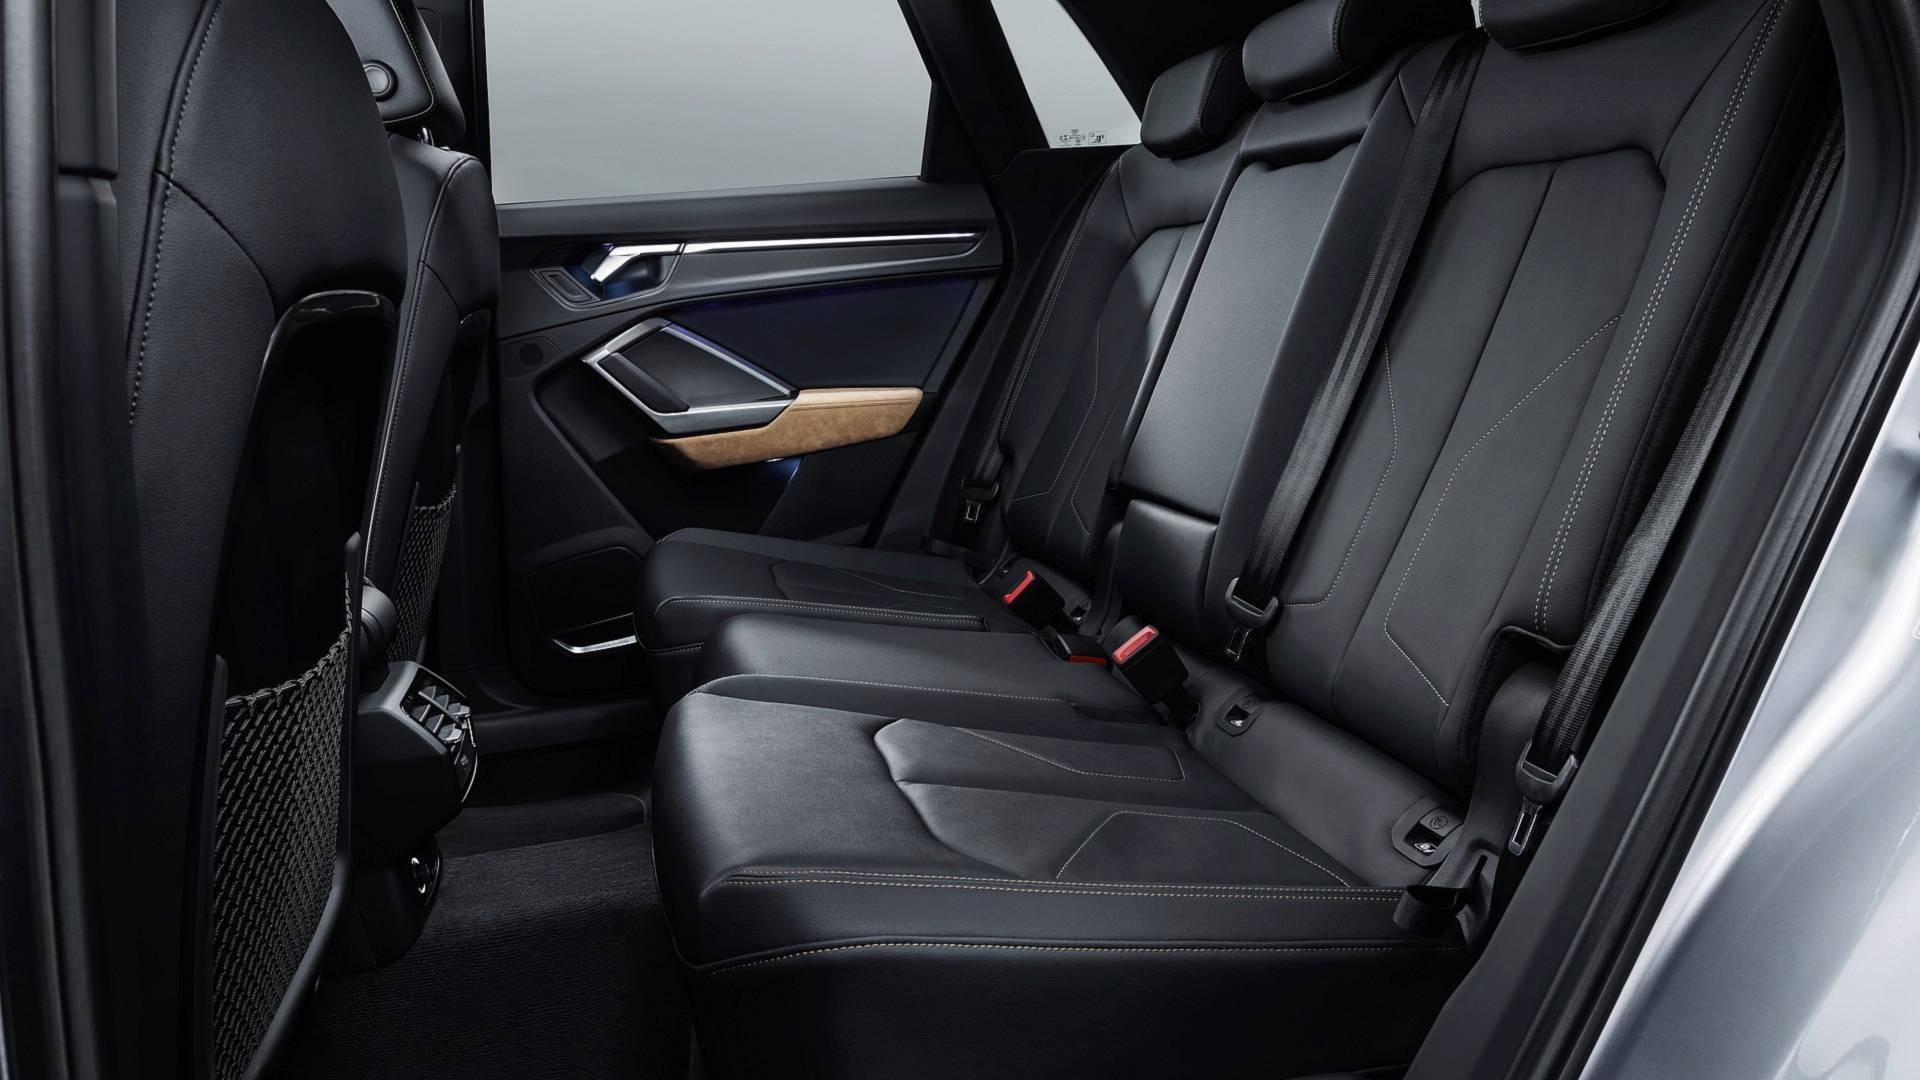 Audi Q3 2018, banco traseiro